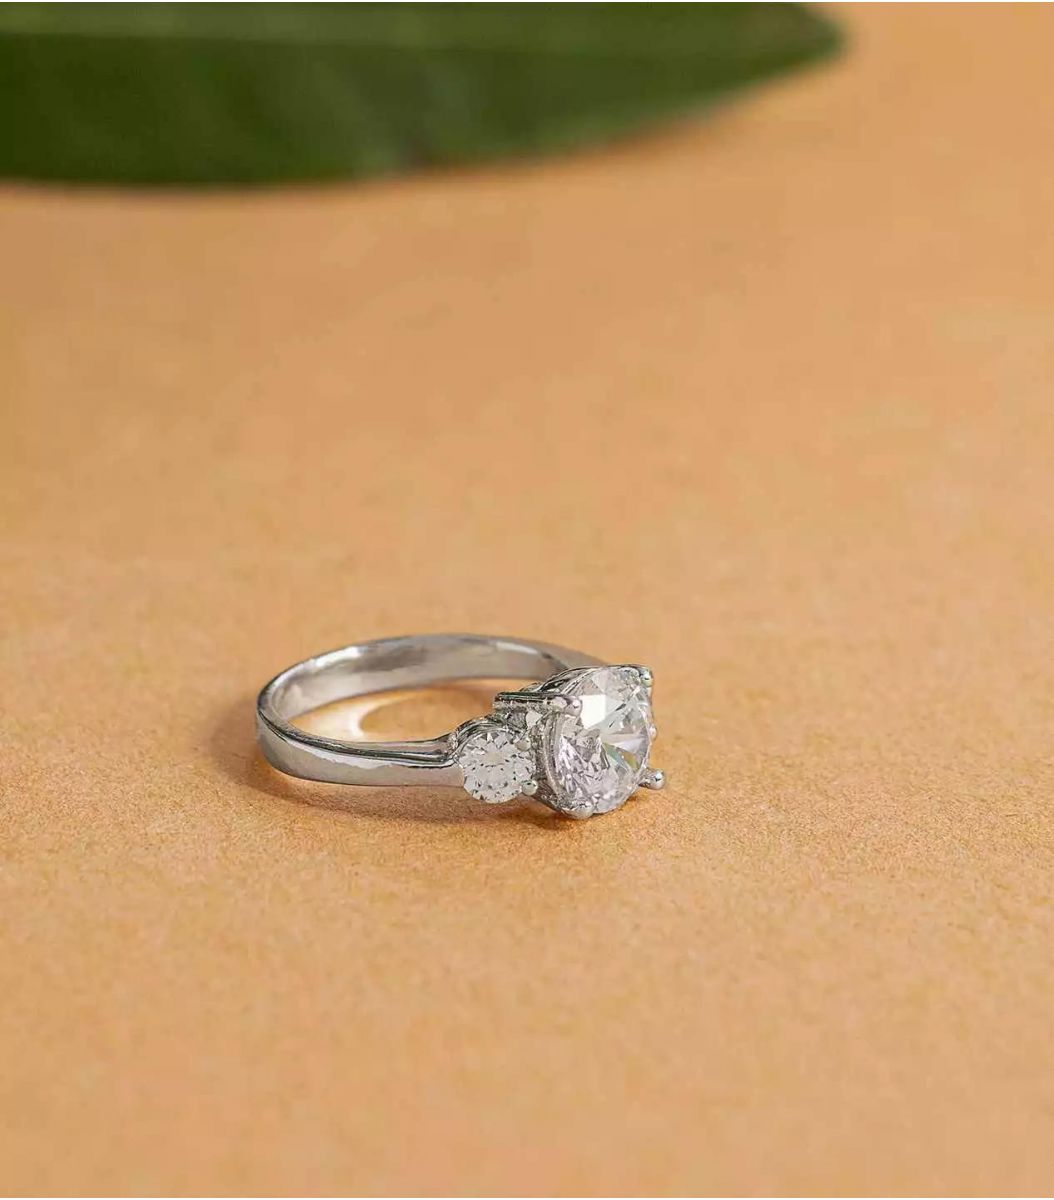 Silver Stone Finger Ring FJ1660227